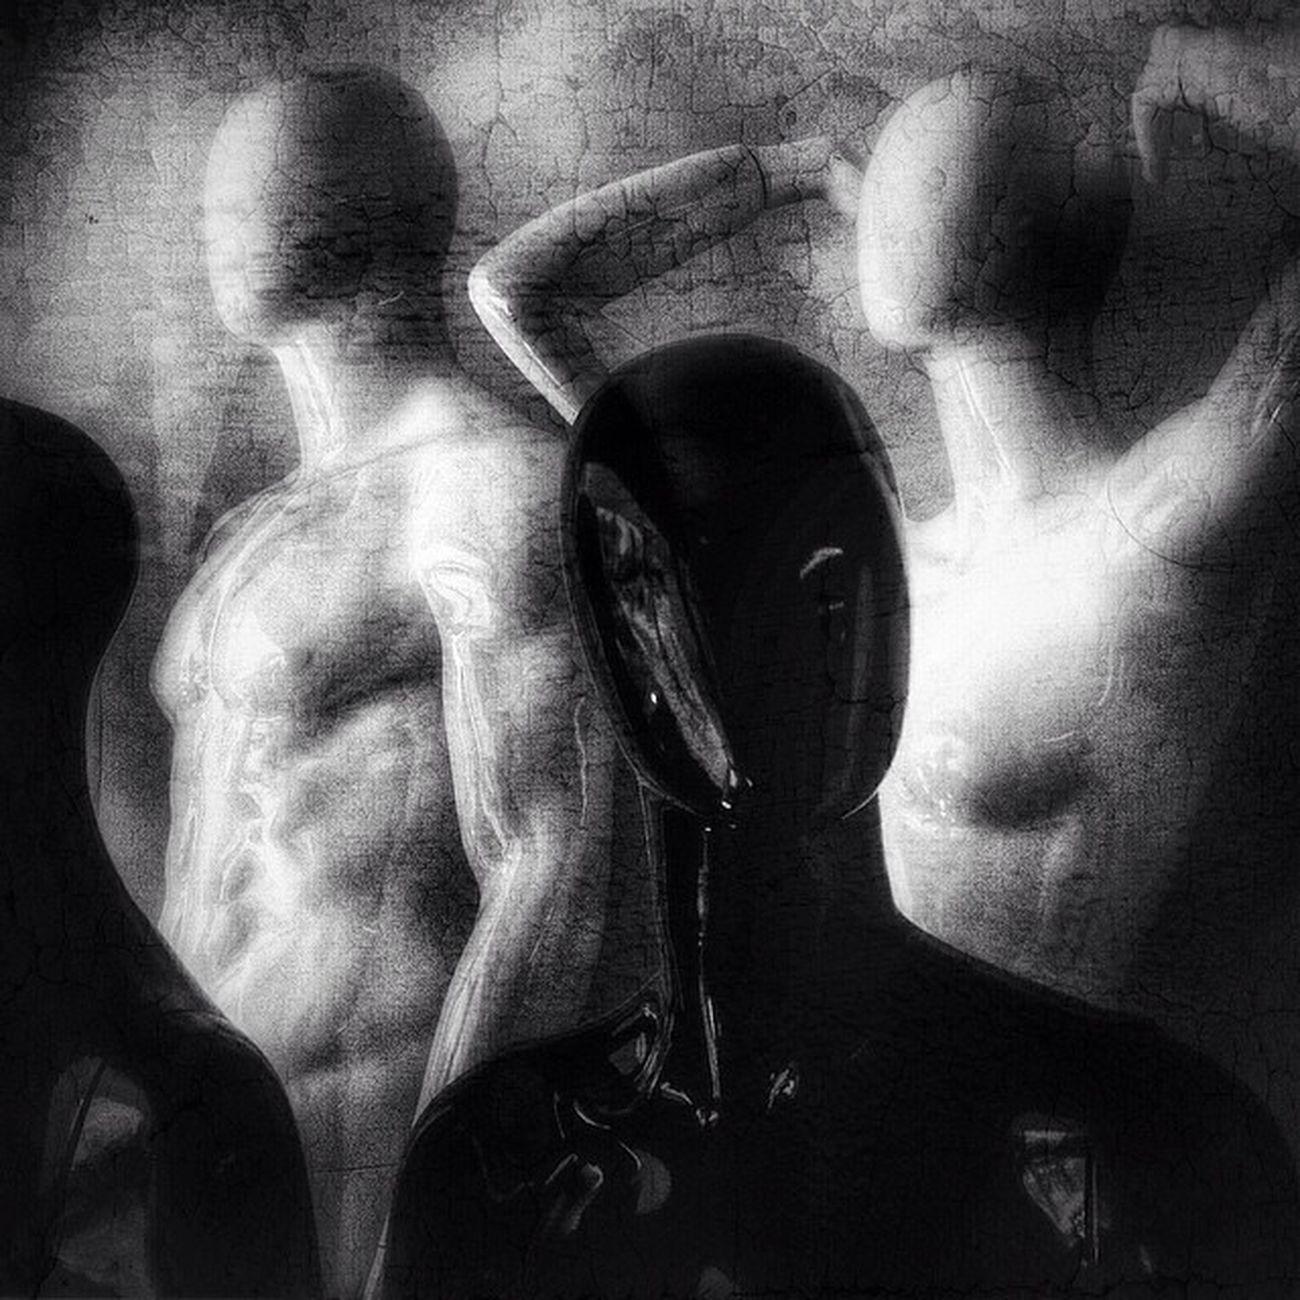 cyborgs Igsomniacs Insta_noir Bnwlife_member Mobgraphia Monoart_ Twenty20 Elgrammuseum Shootermag_brasil